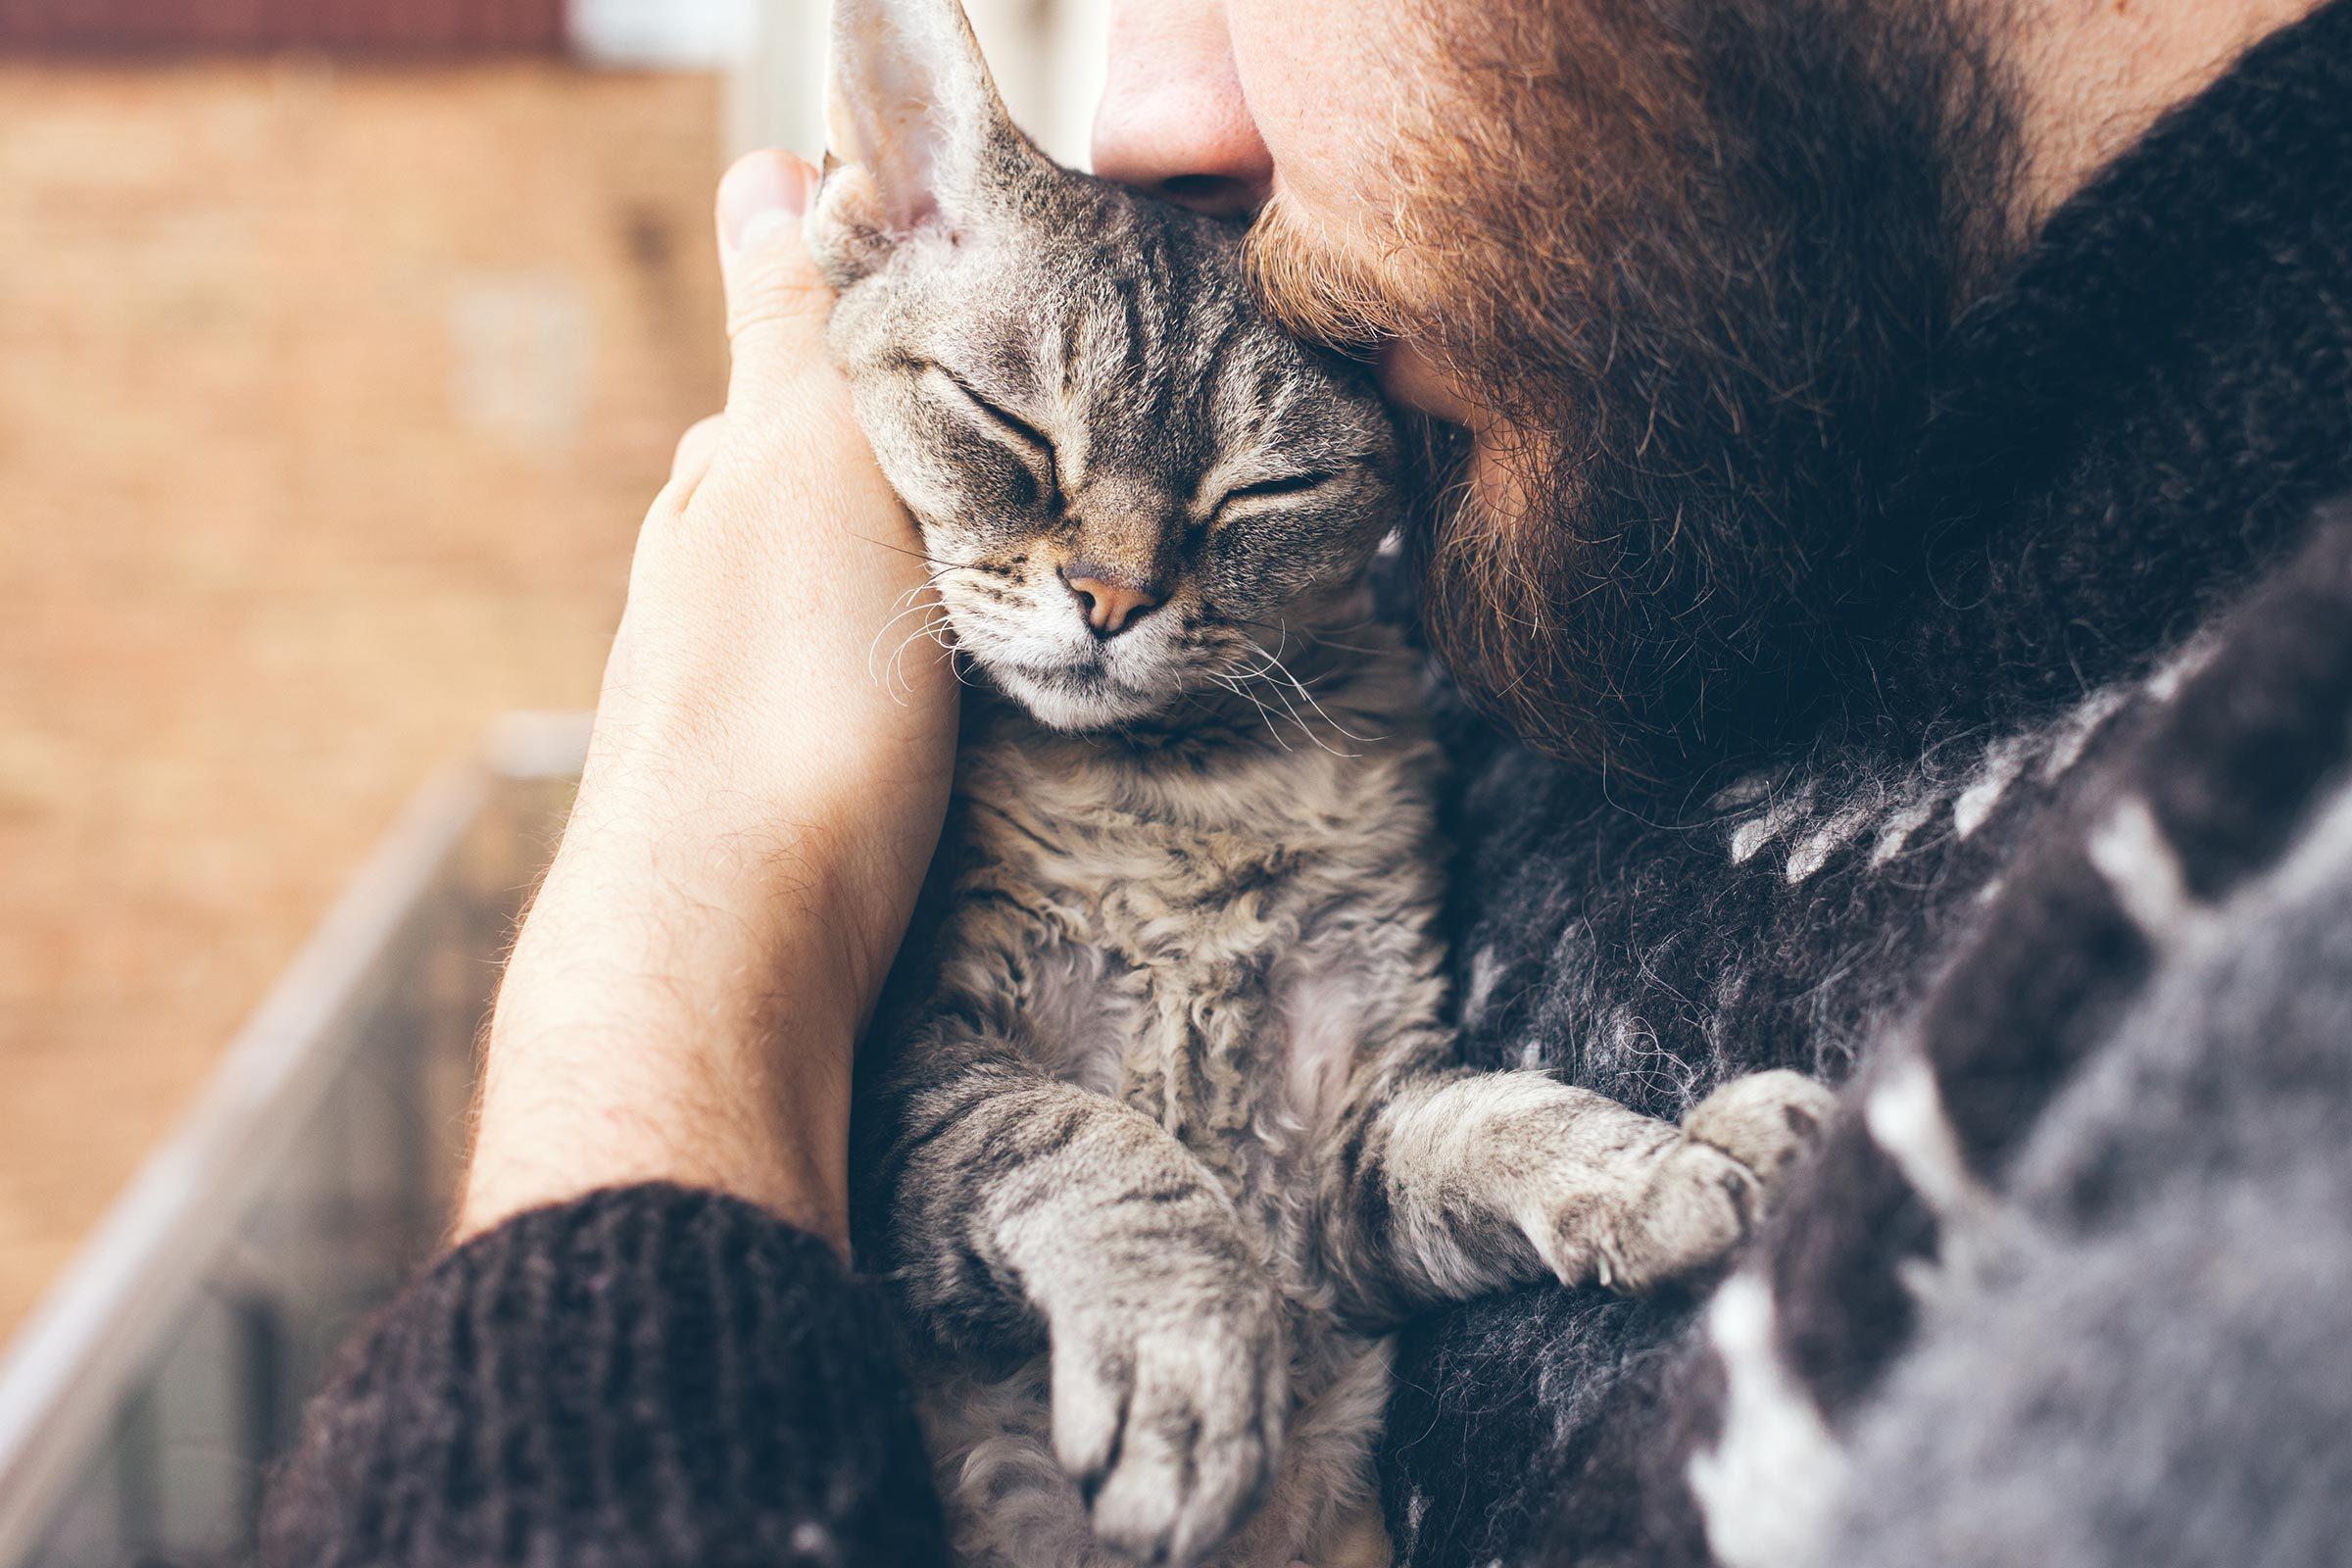 cat pet kiss